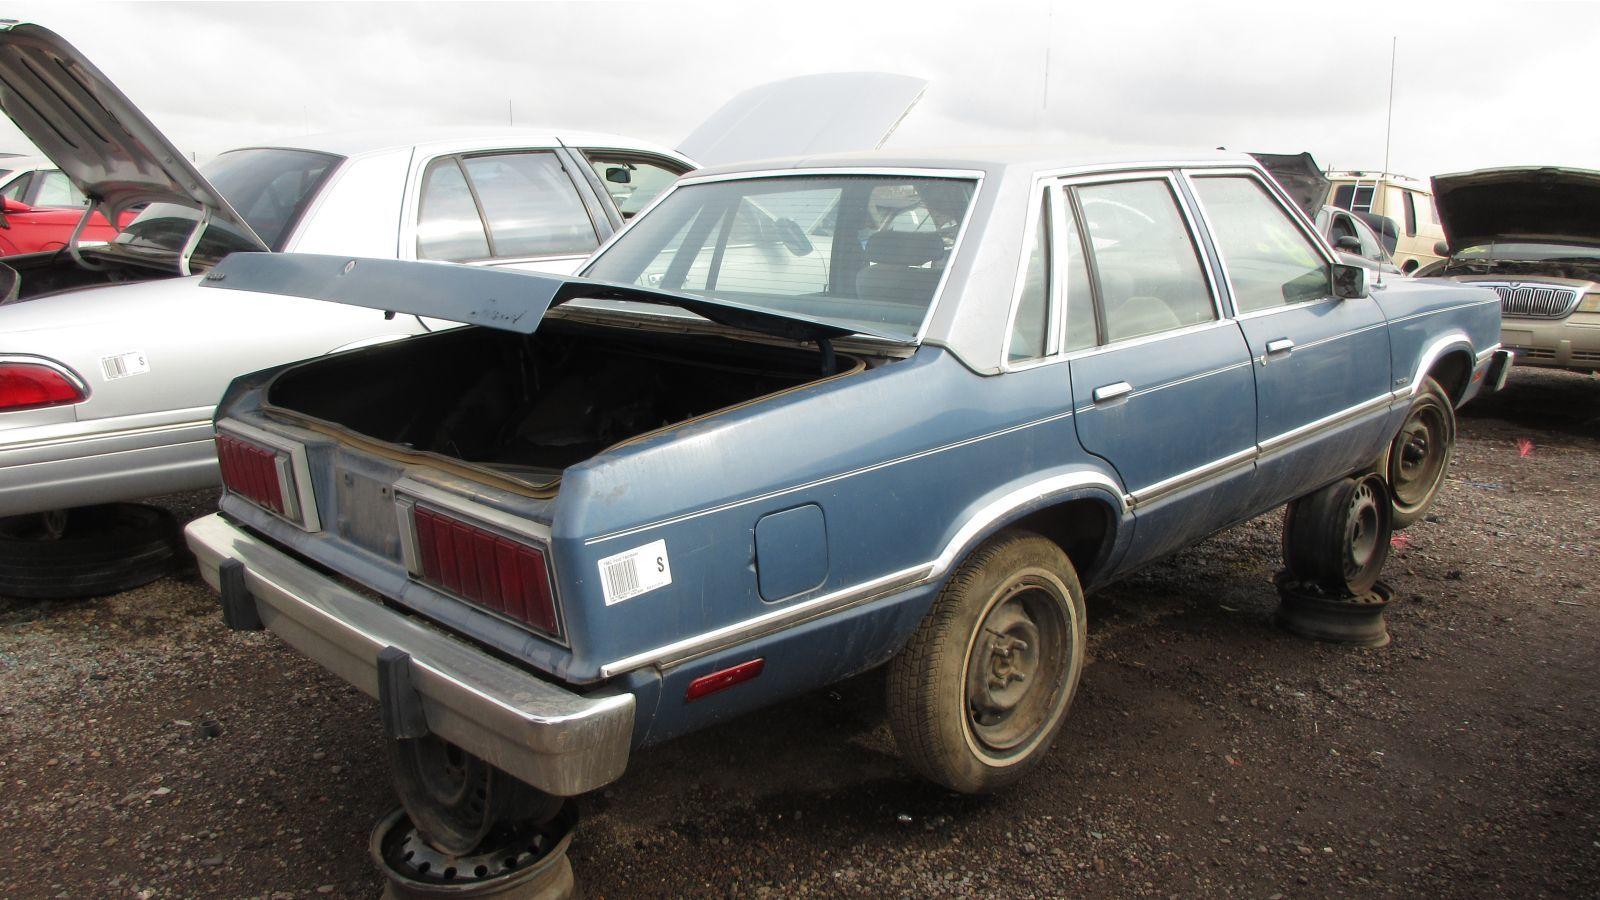 На свалке нашли редкий седан Ford 1